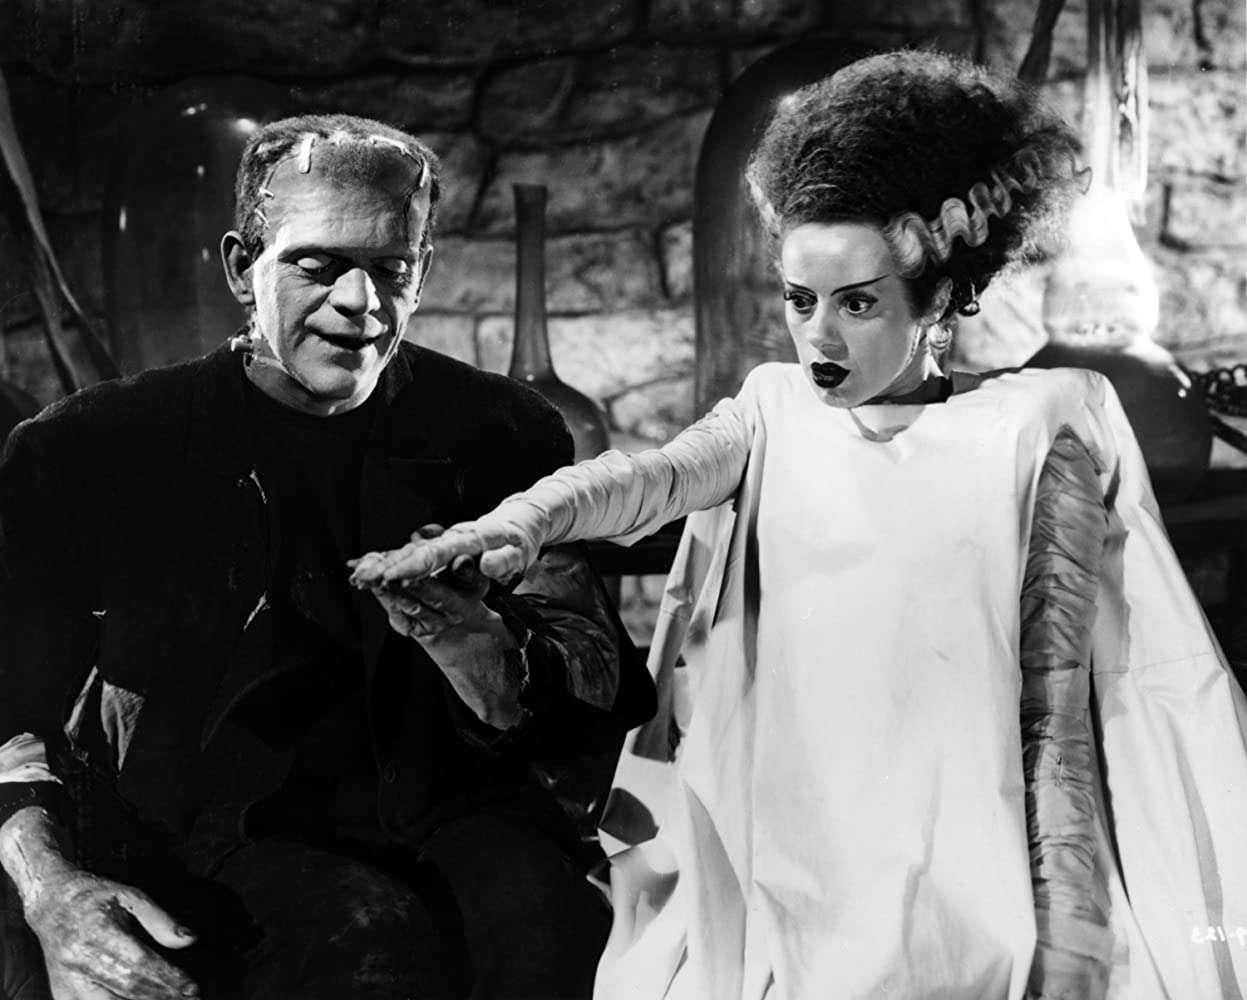 The-Bride-of-Frankenstein-1935